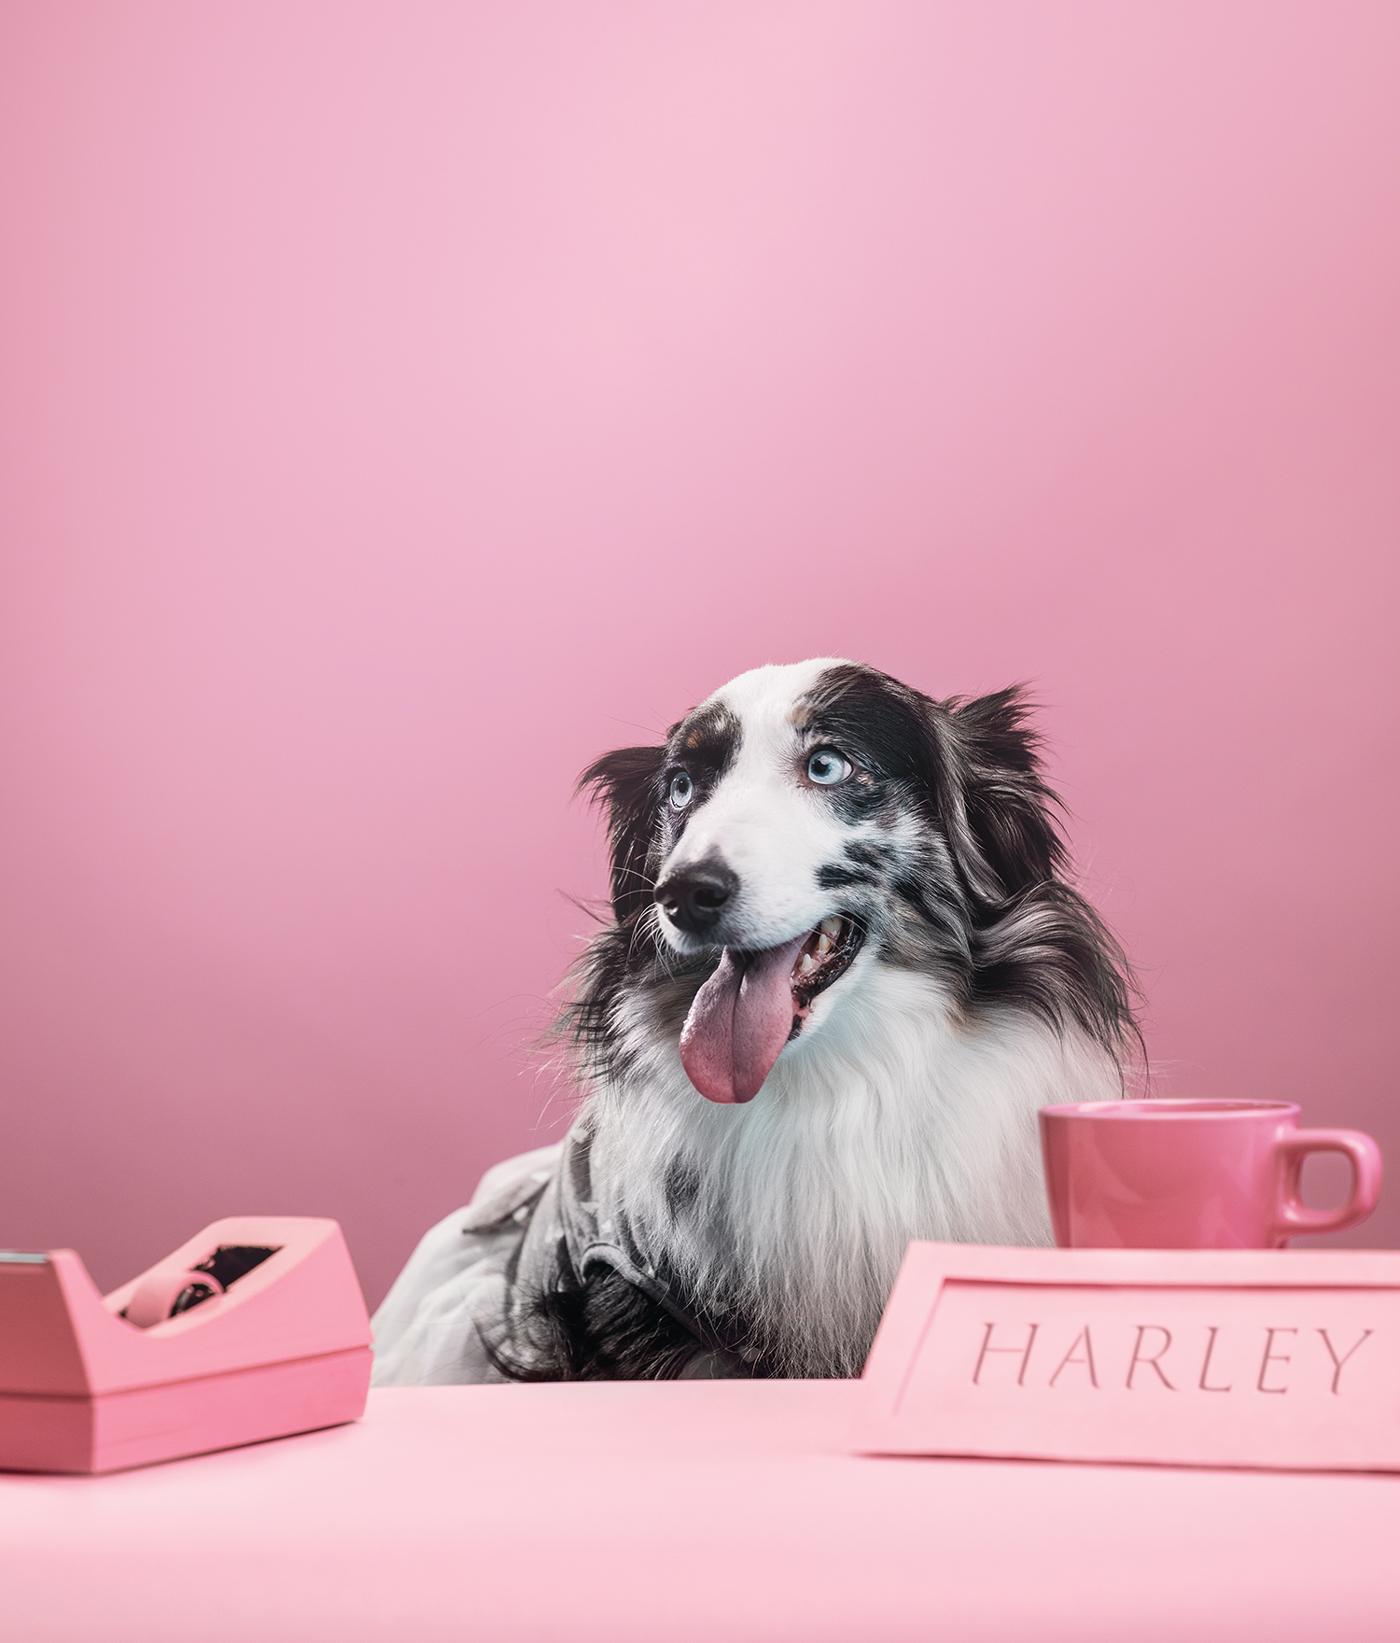 Dogs_Harley.jpg